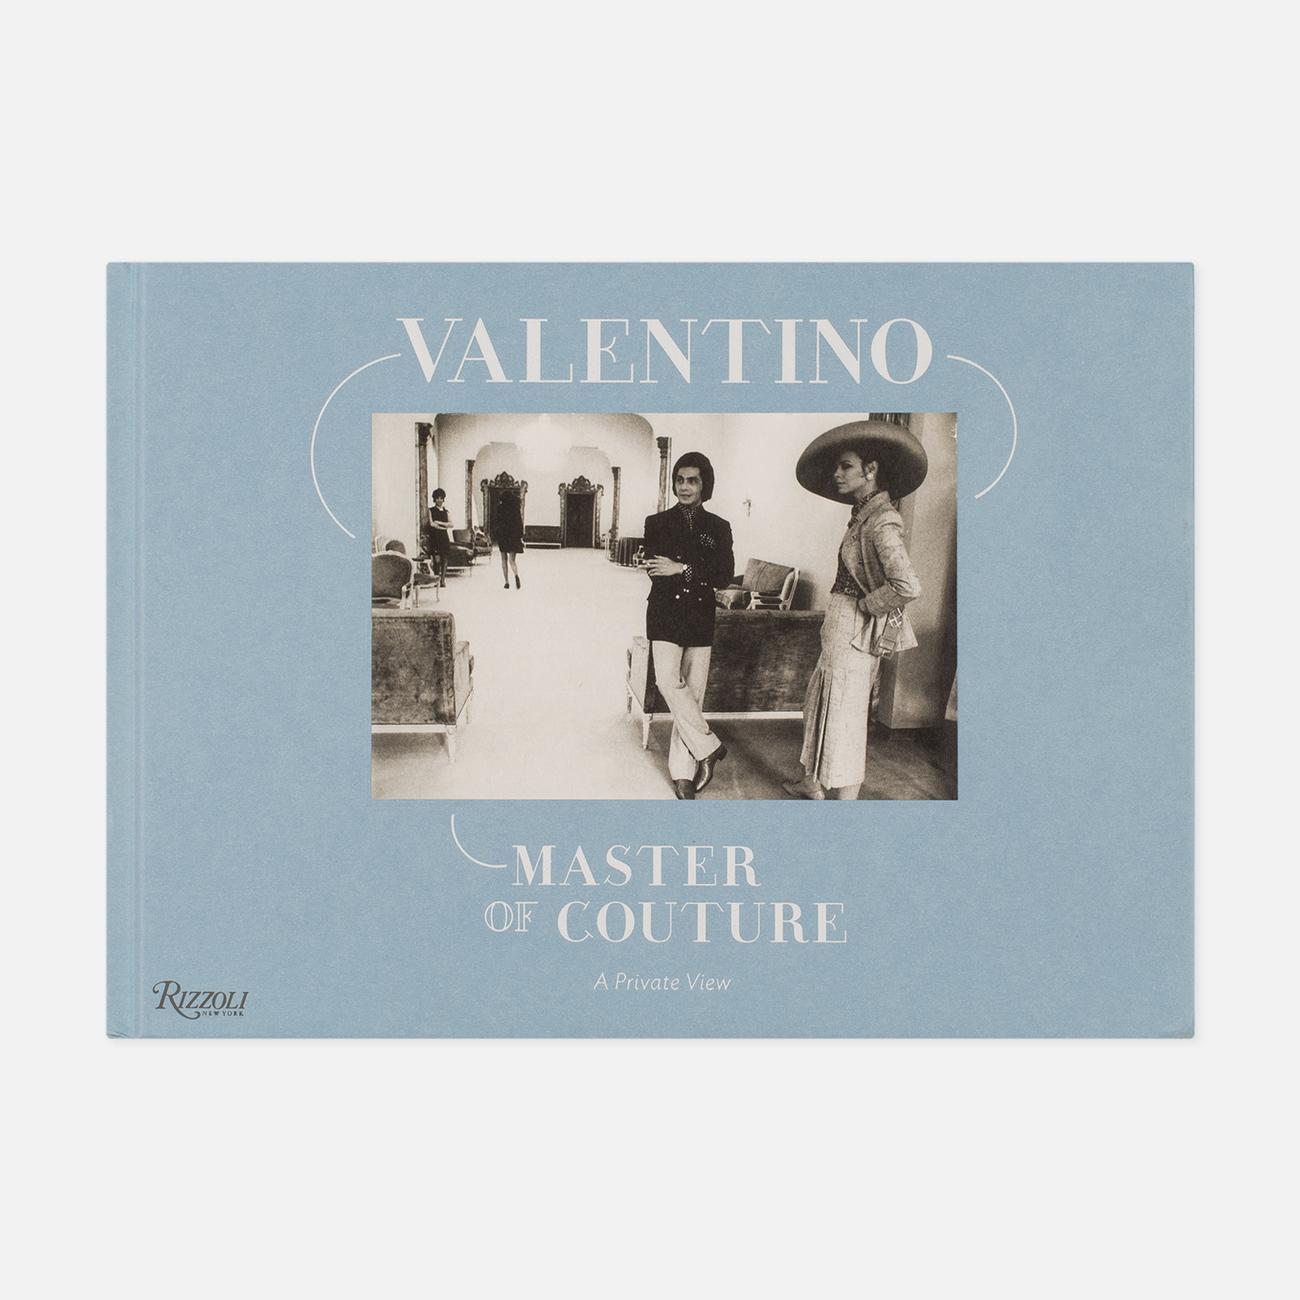 Книга Rizzoli Valentino Master Of Couture 112 pgs